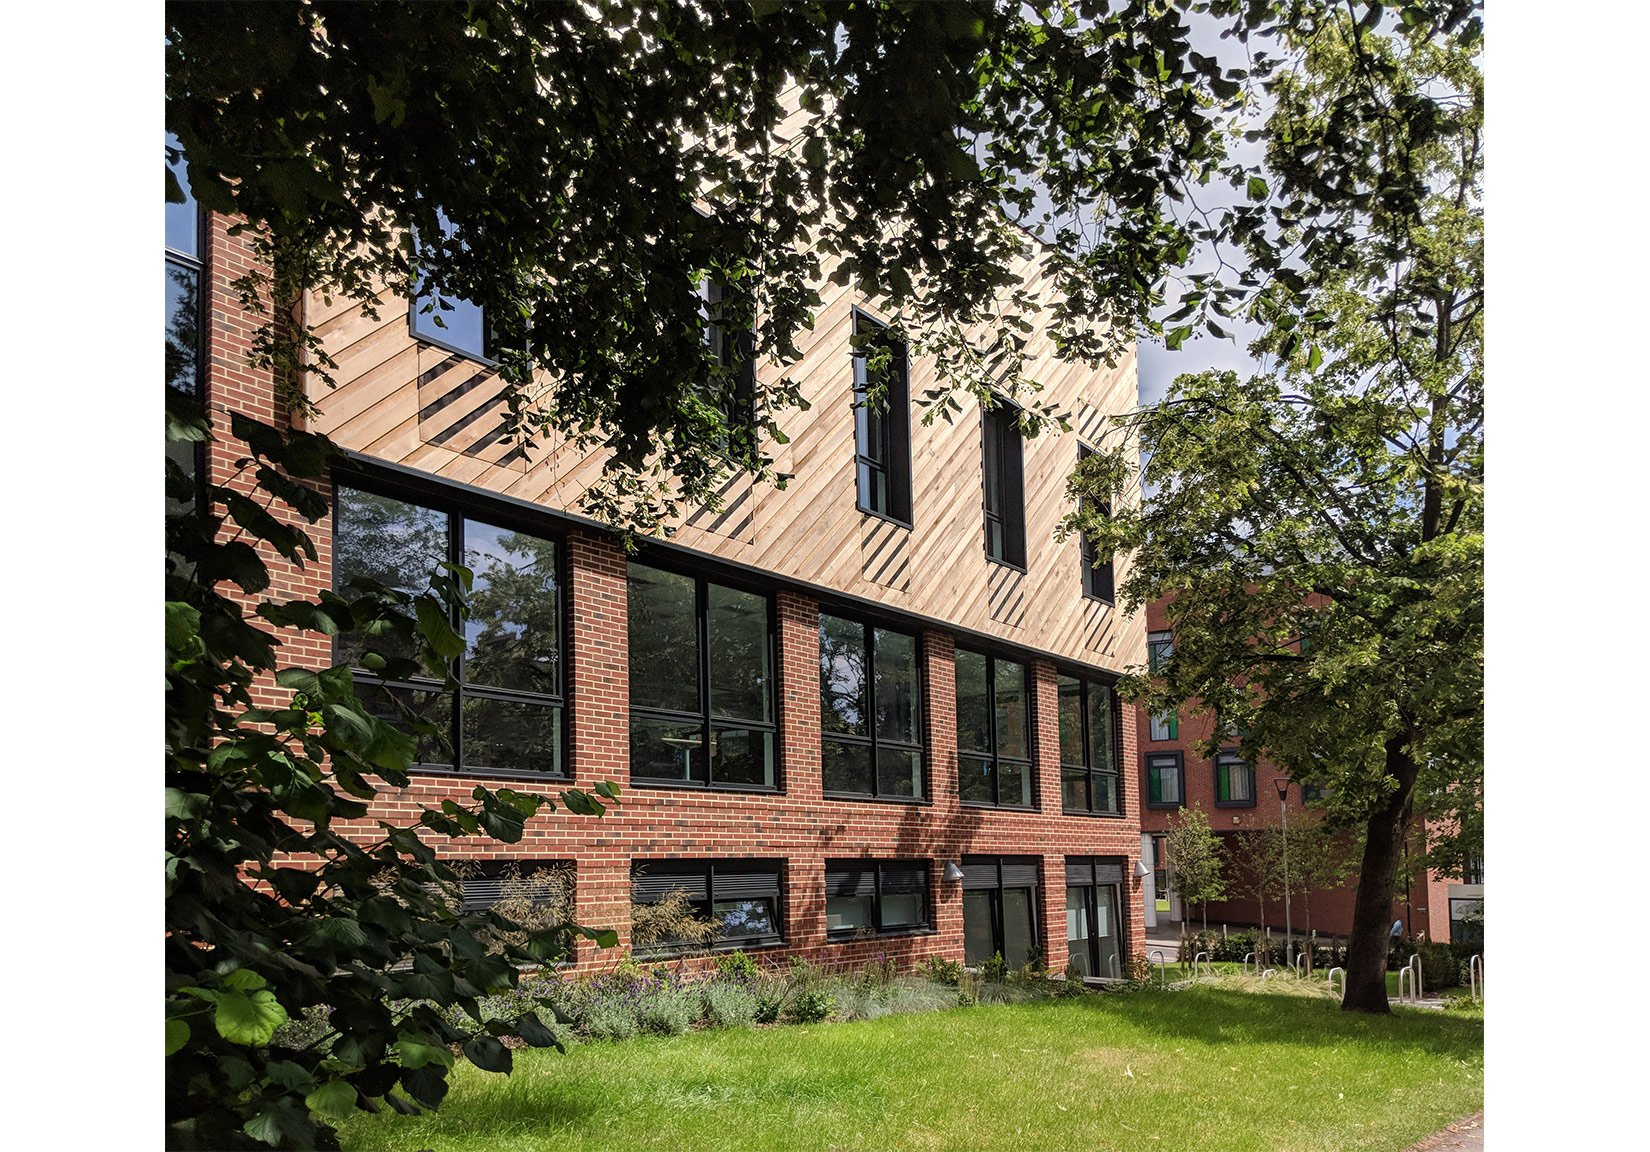 Newlyn Building, University of Leeds, Landscaping